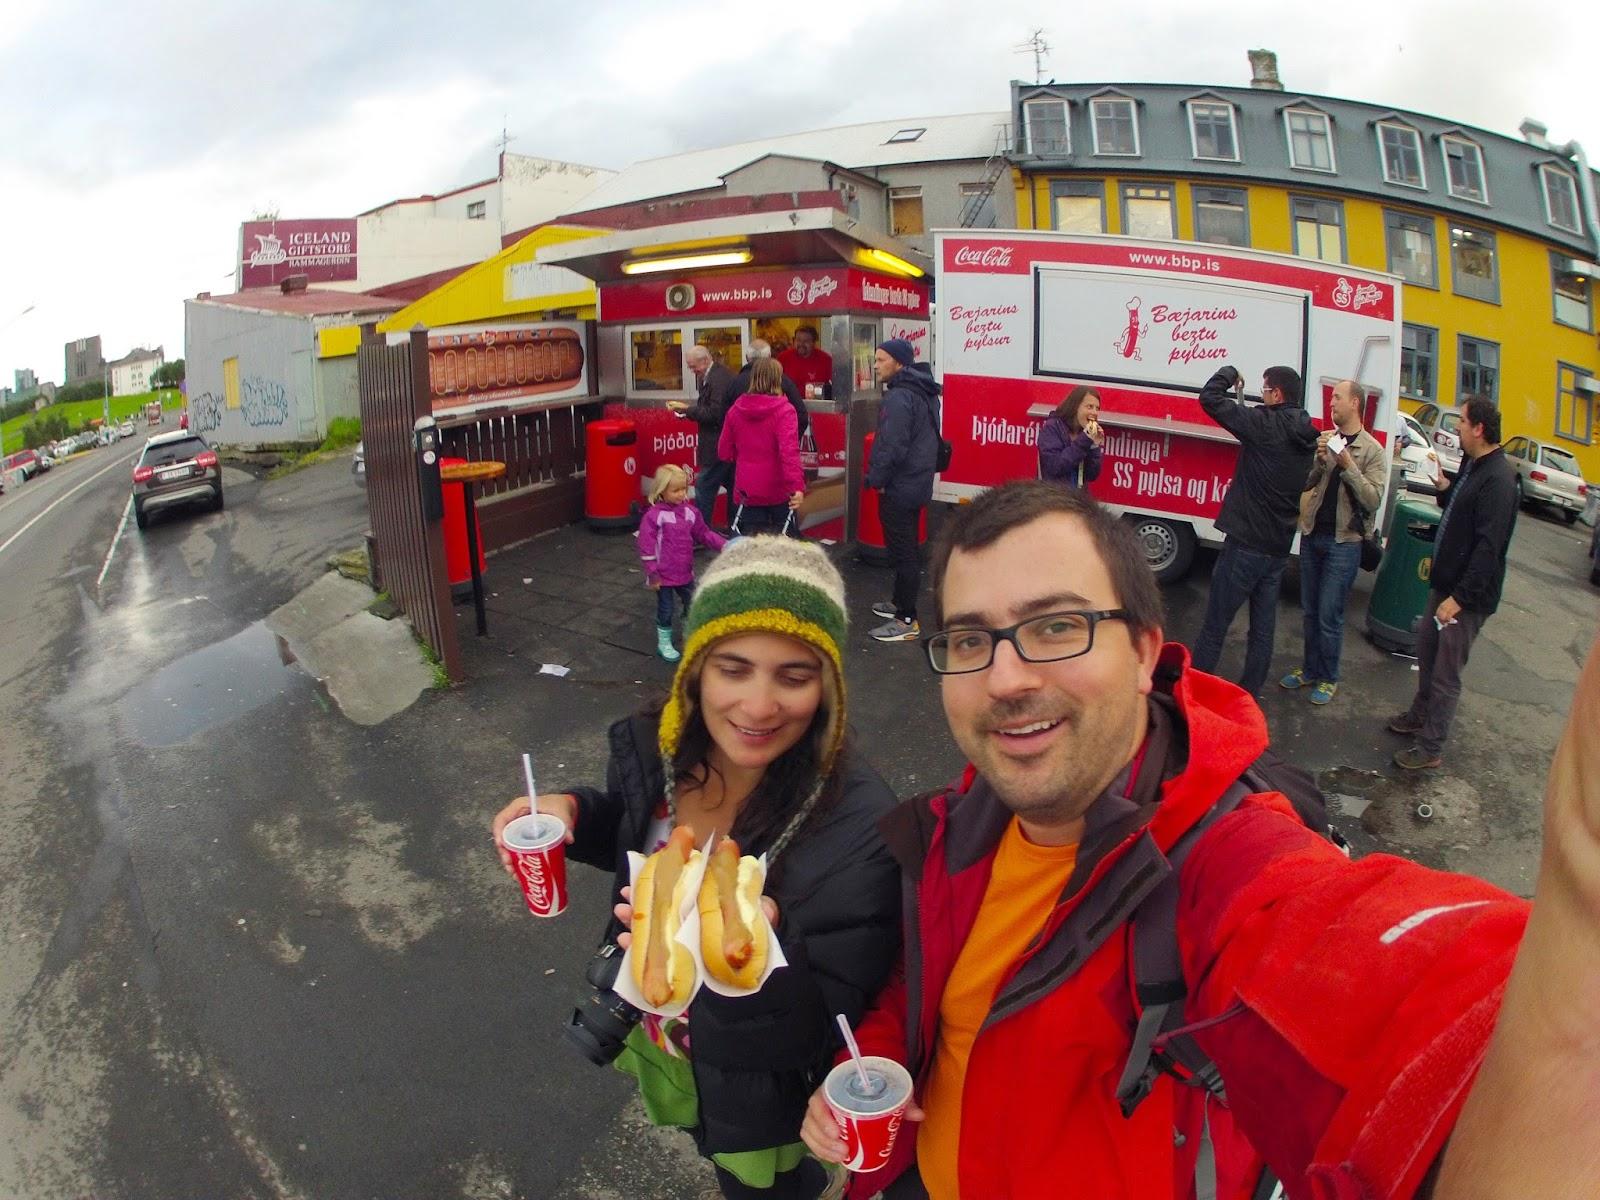 Visitar REYKJAVIK, a capital do Atlântico norte | Islândia